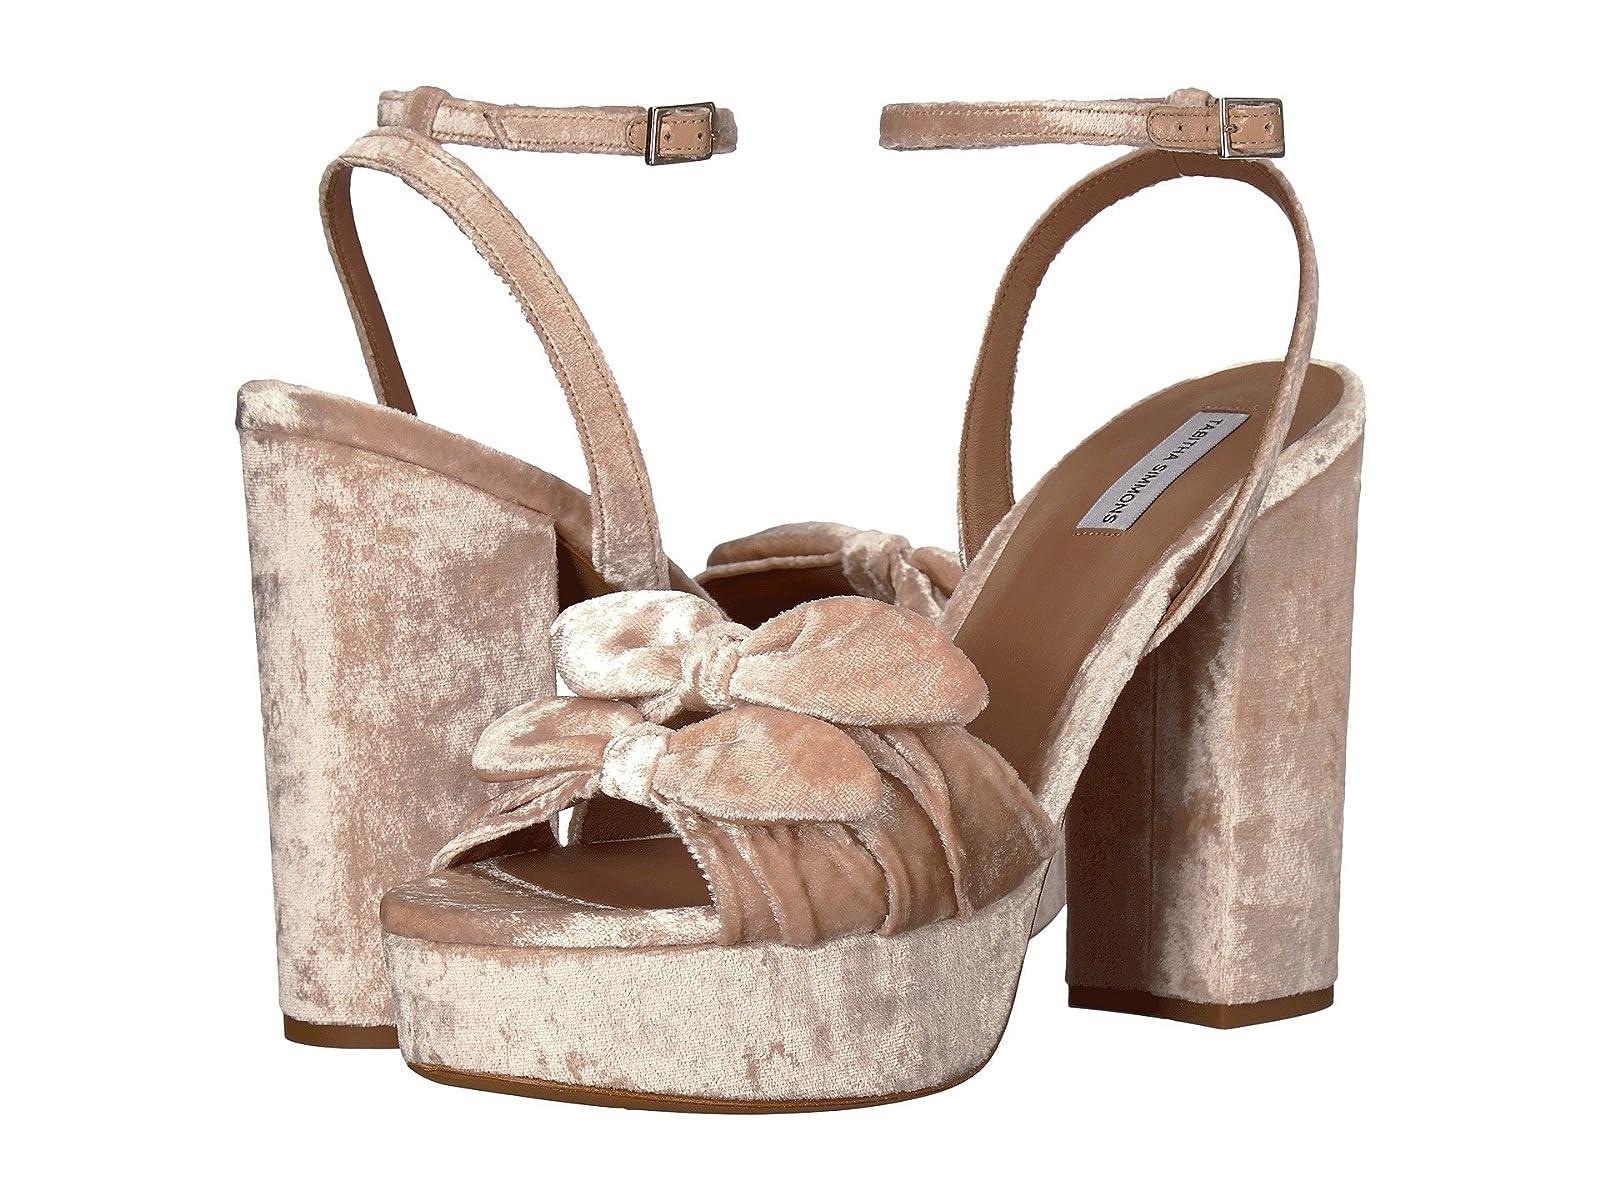 Tabitha Simmons JodieCheap and distinctive eye-catching shoes